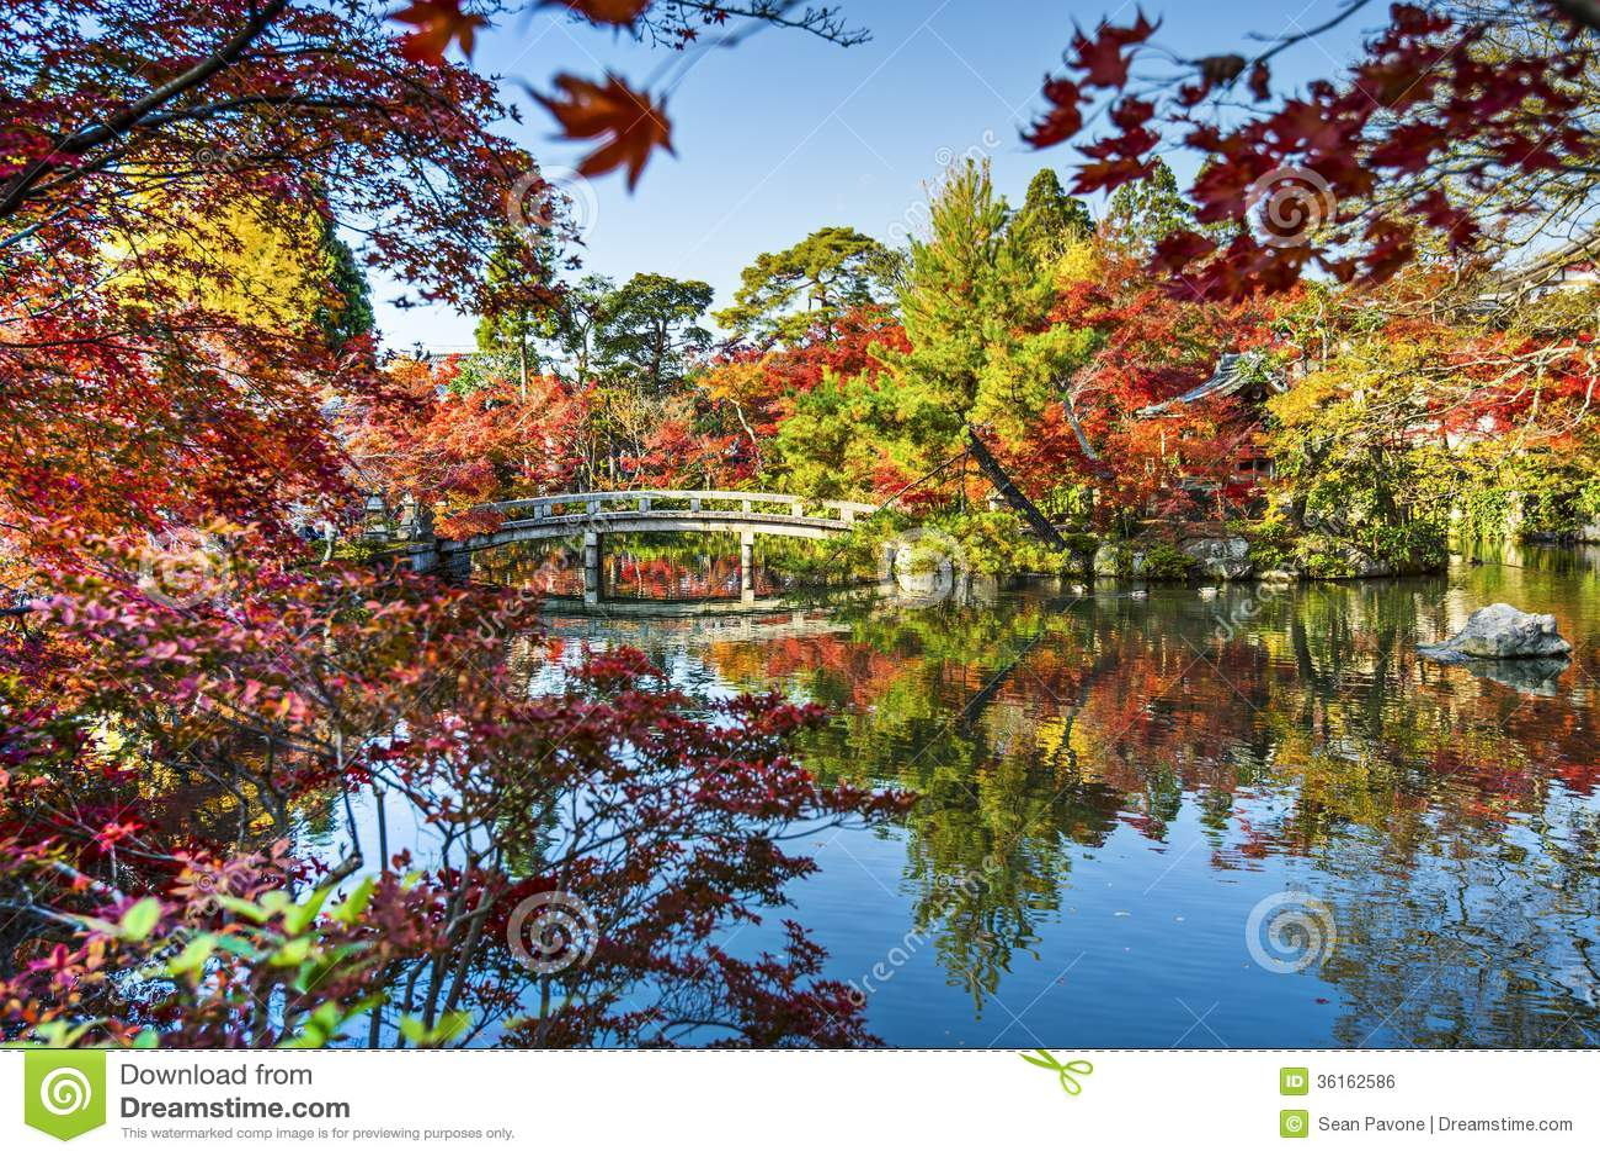 Kyoto Gardens Royalty Free Stock Image - Image: 36162586